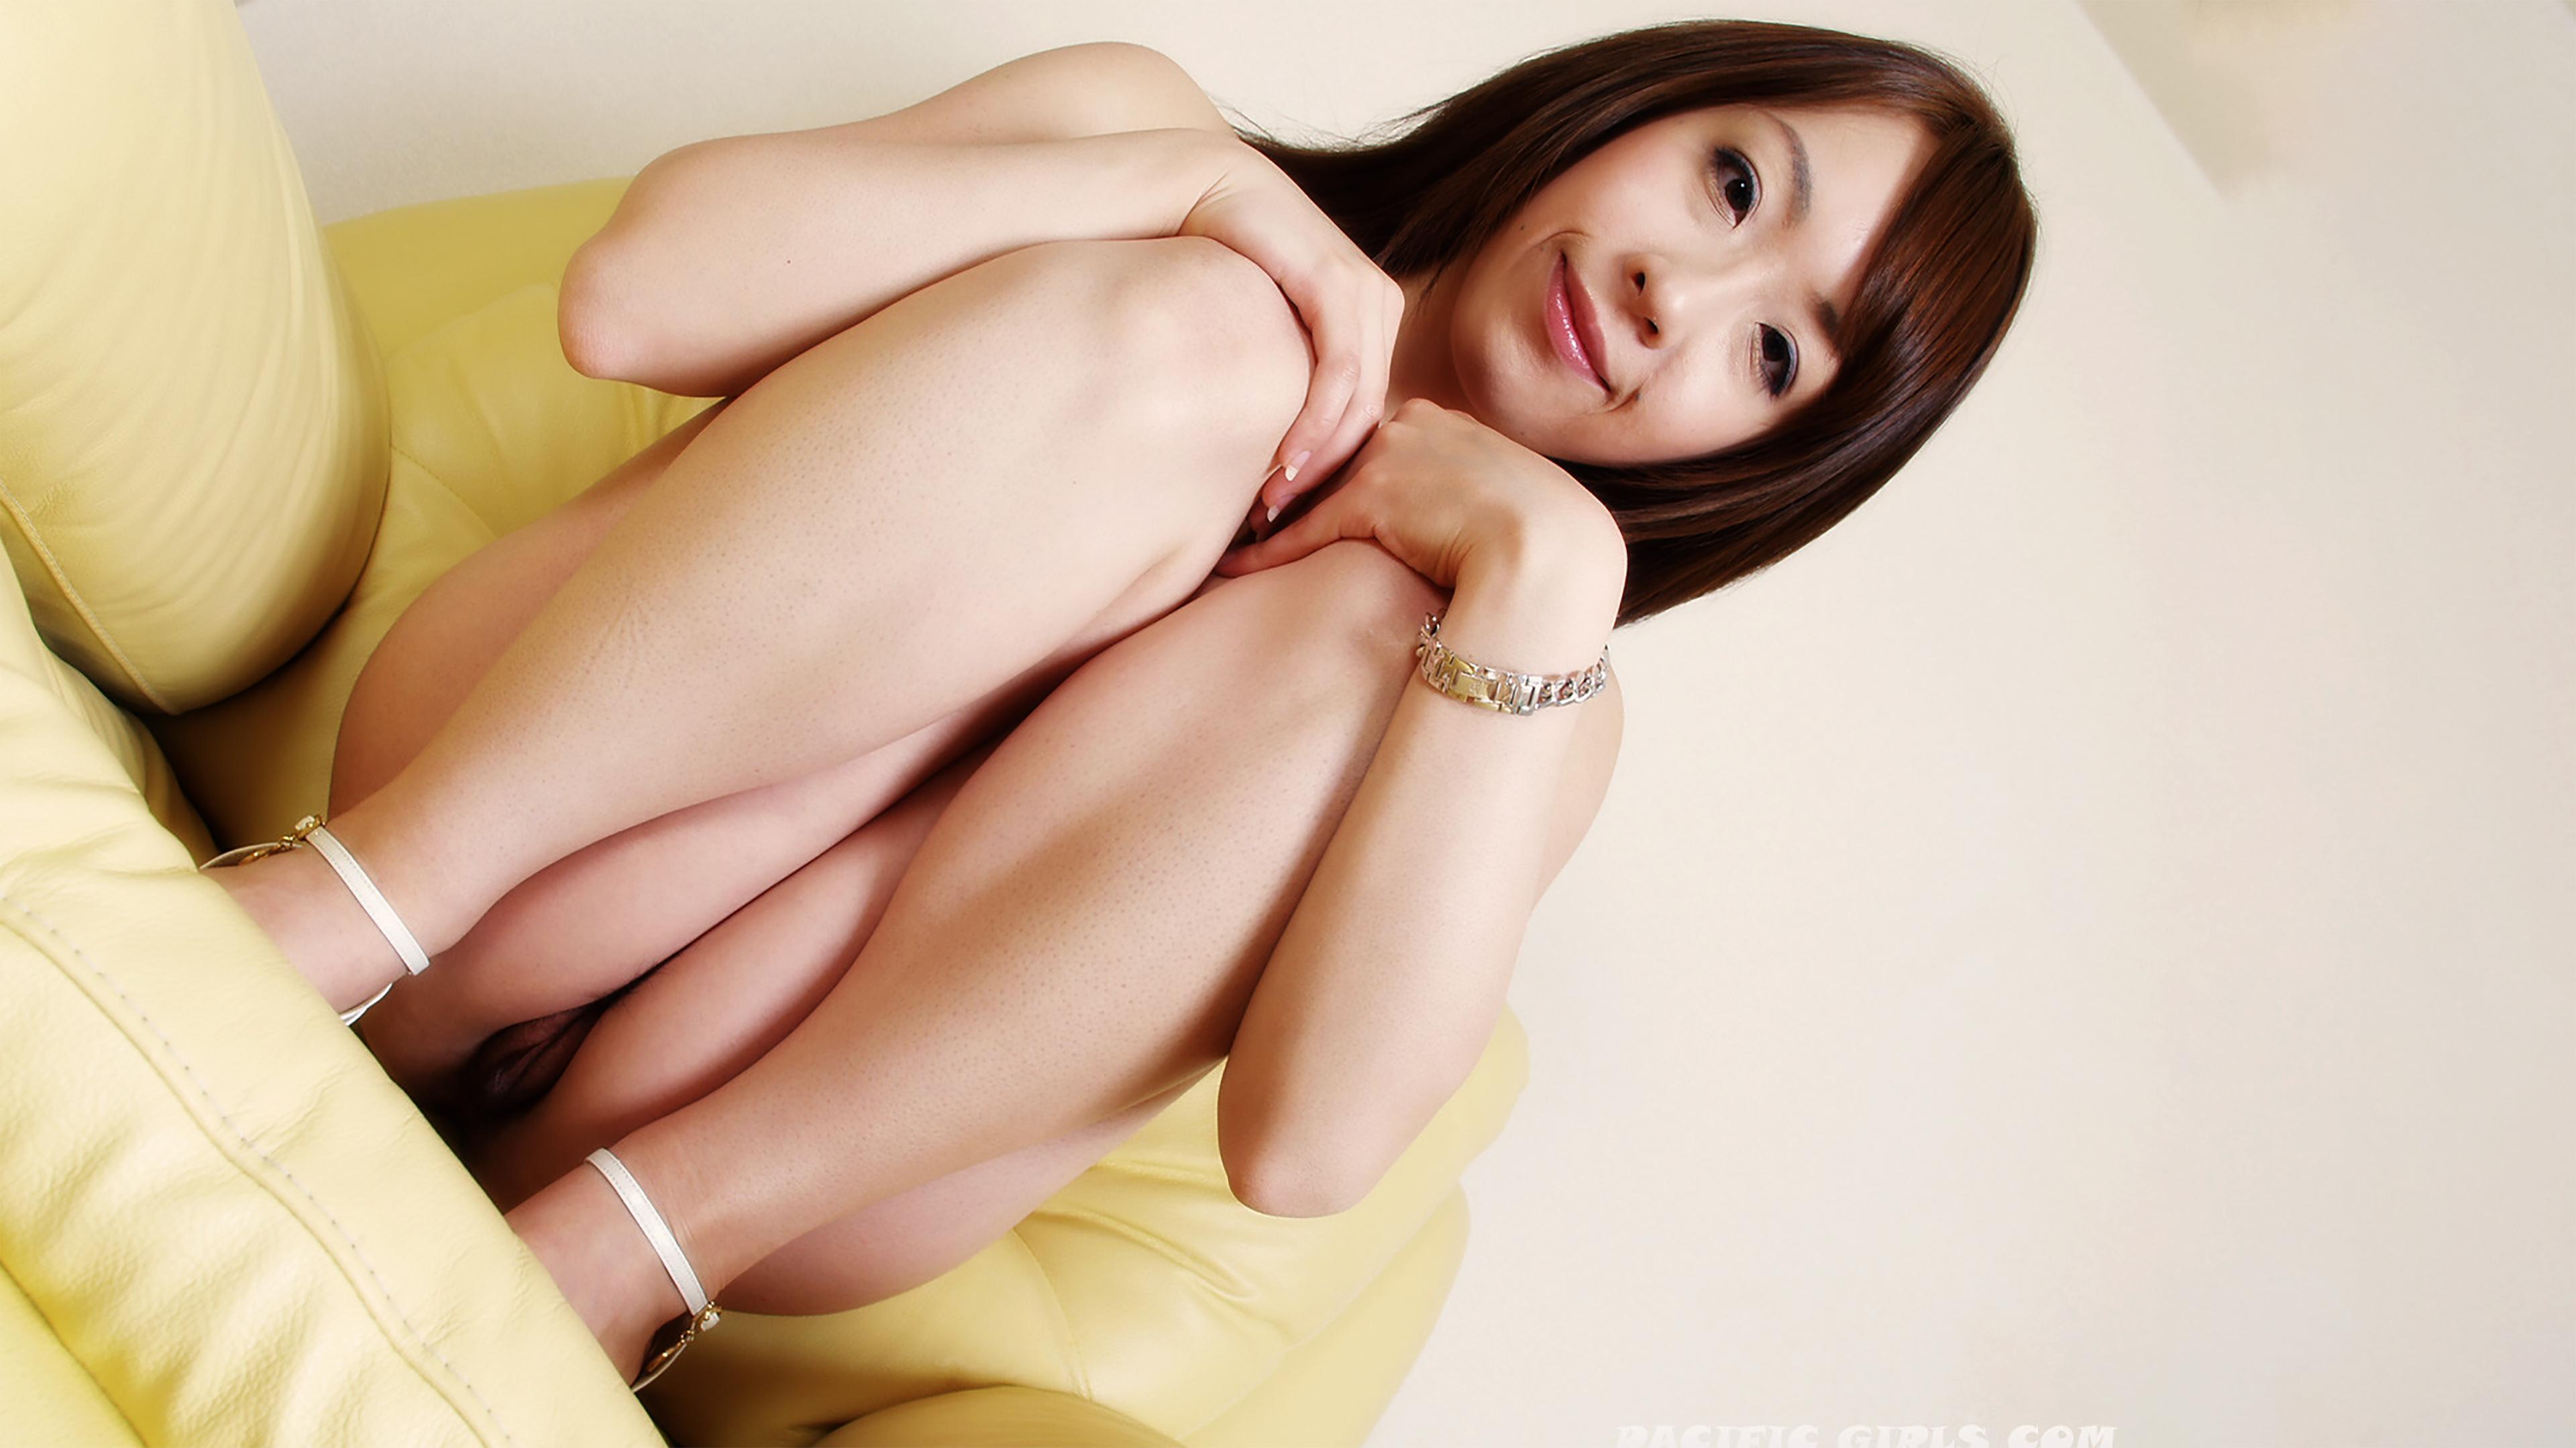 Asian female bodybuilder by mattemuscle on deviantart